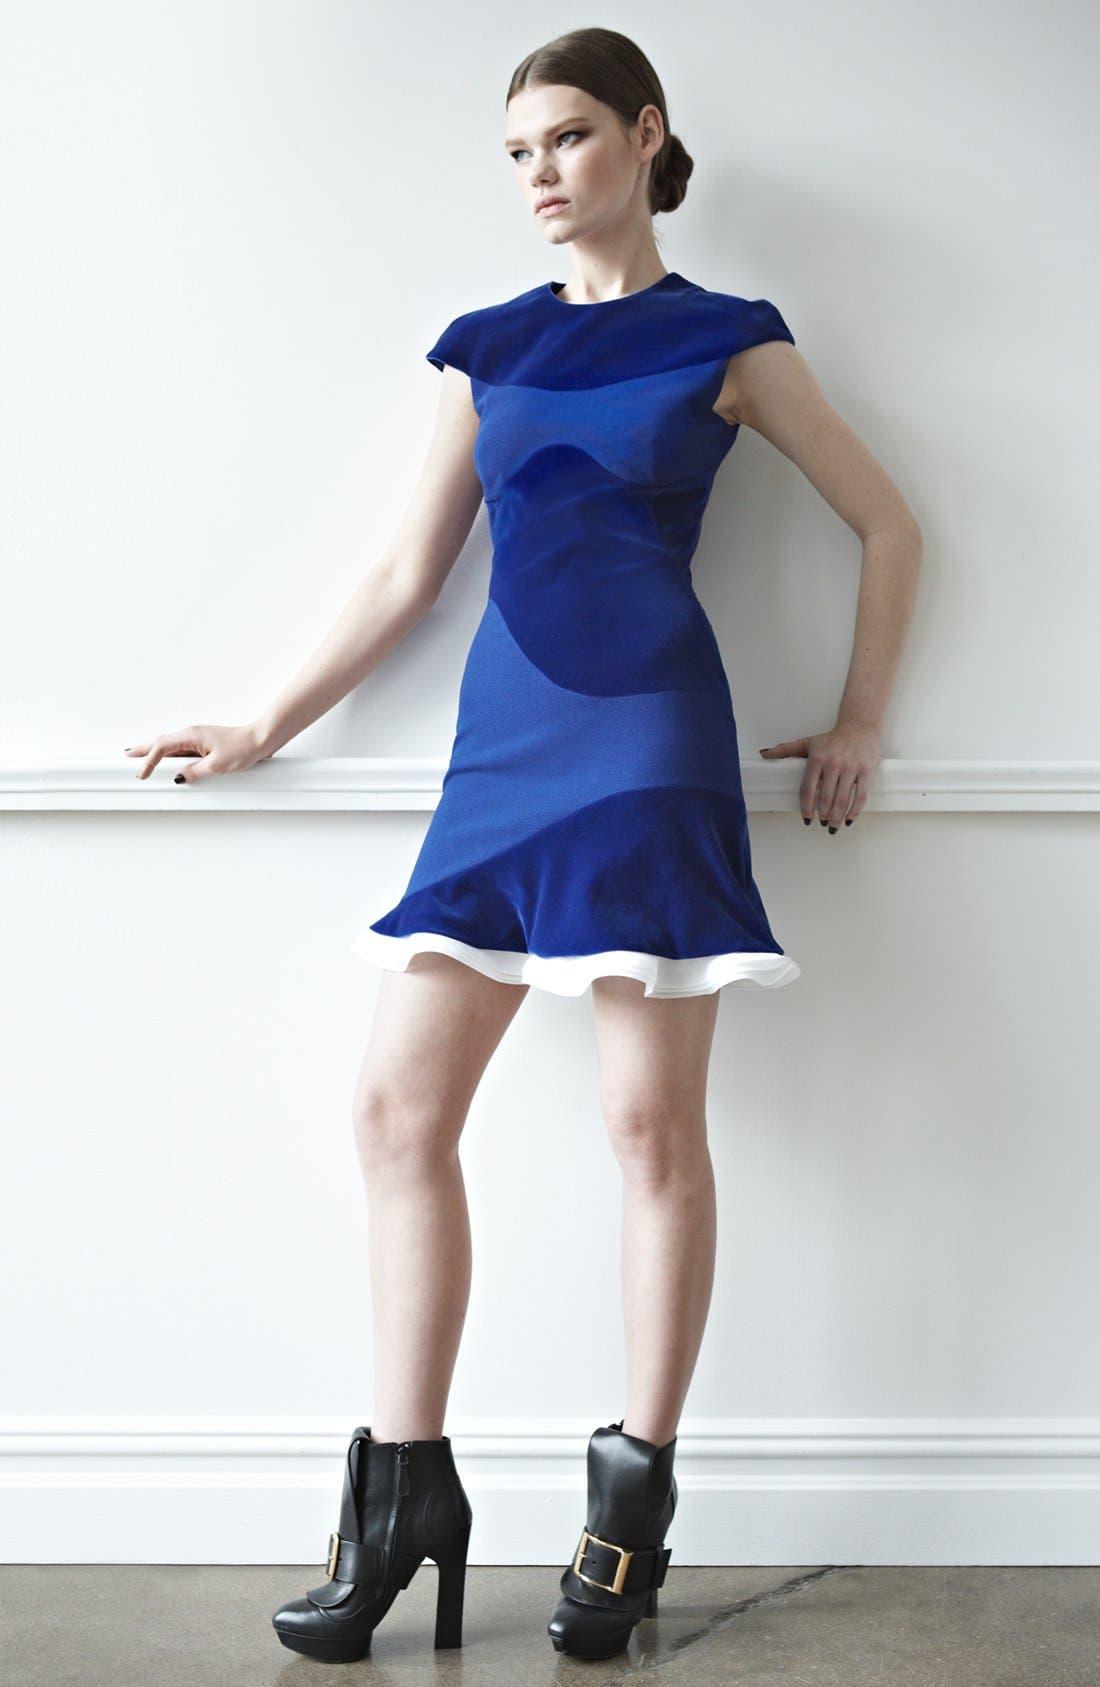 Main Image - Alexander McQueen Dress & Accessories